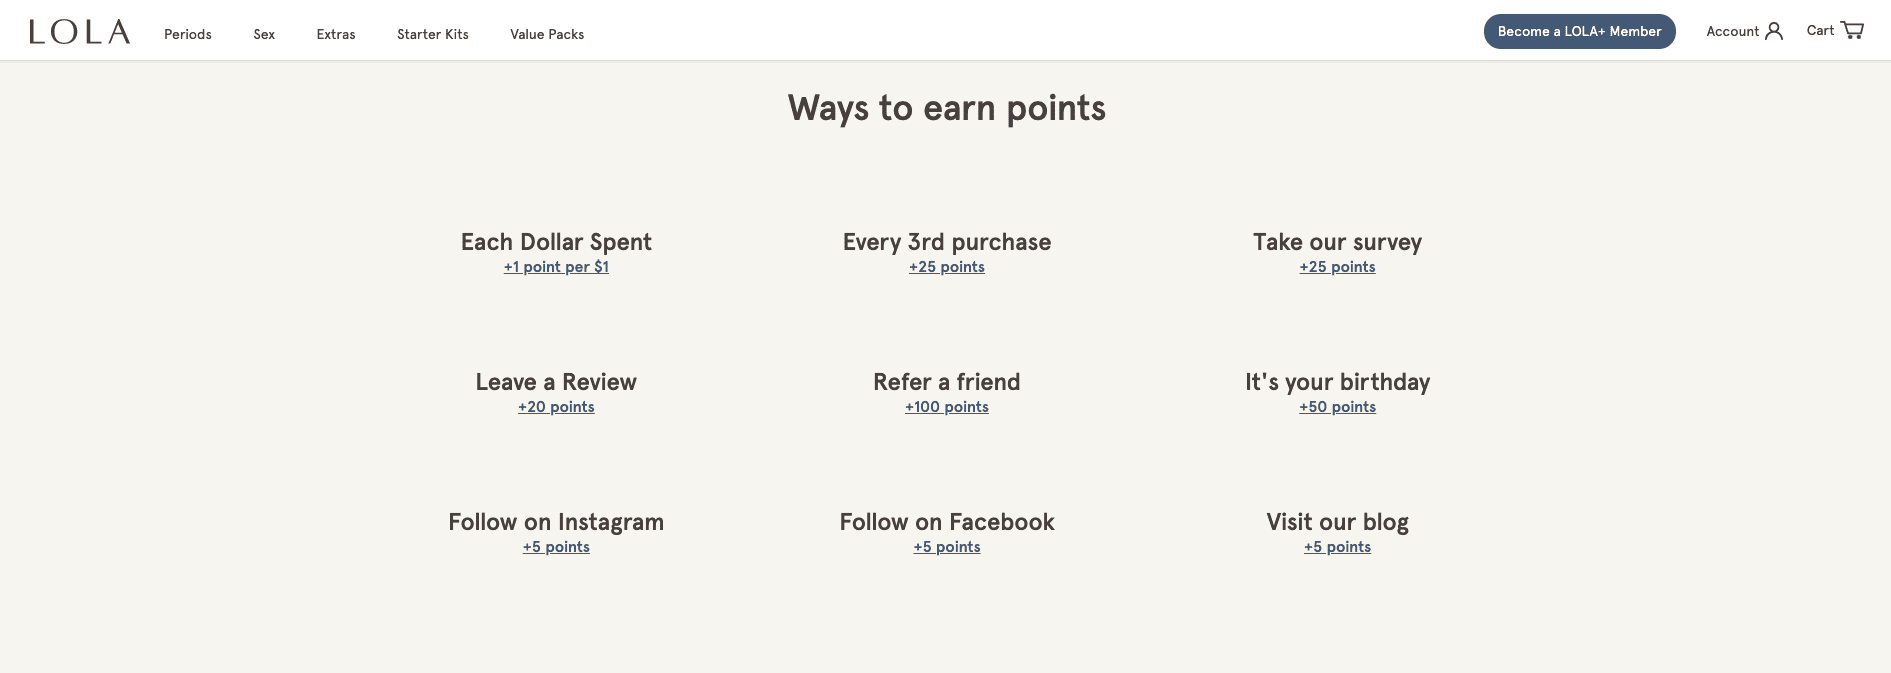 Screenshot of LOLA's rewards program page